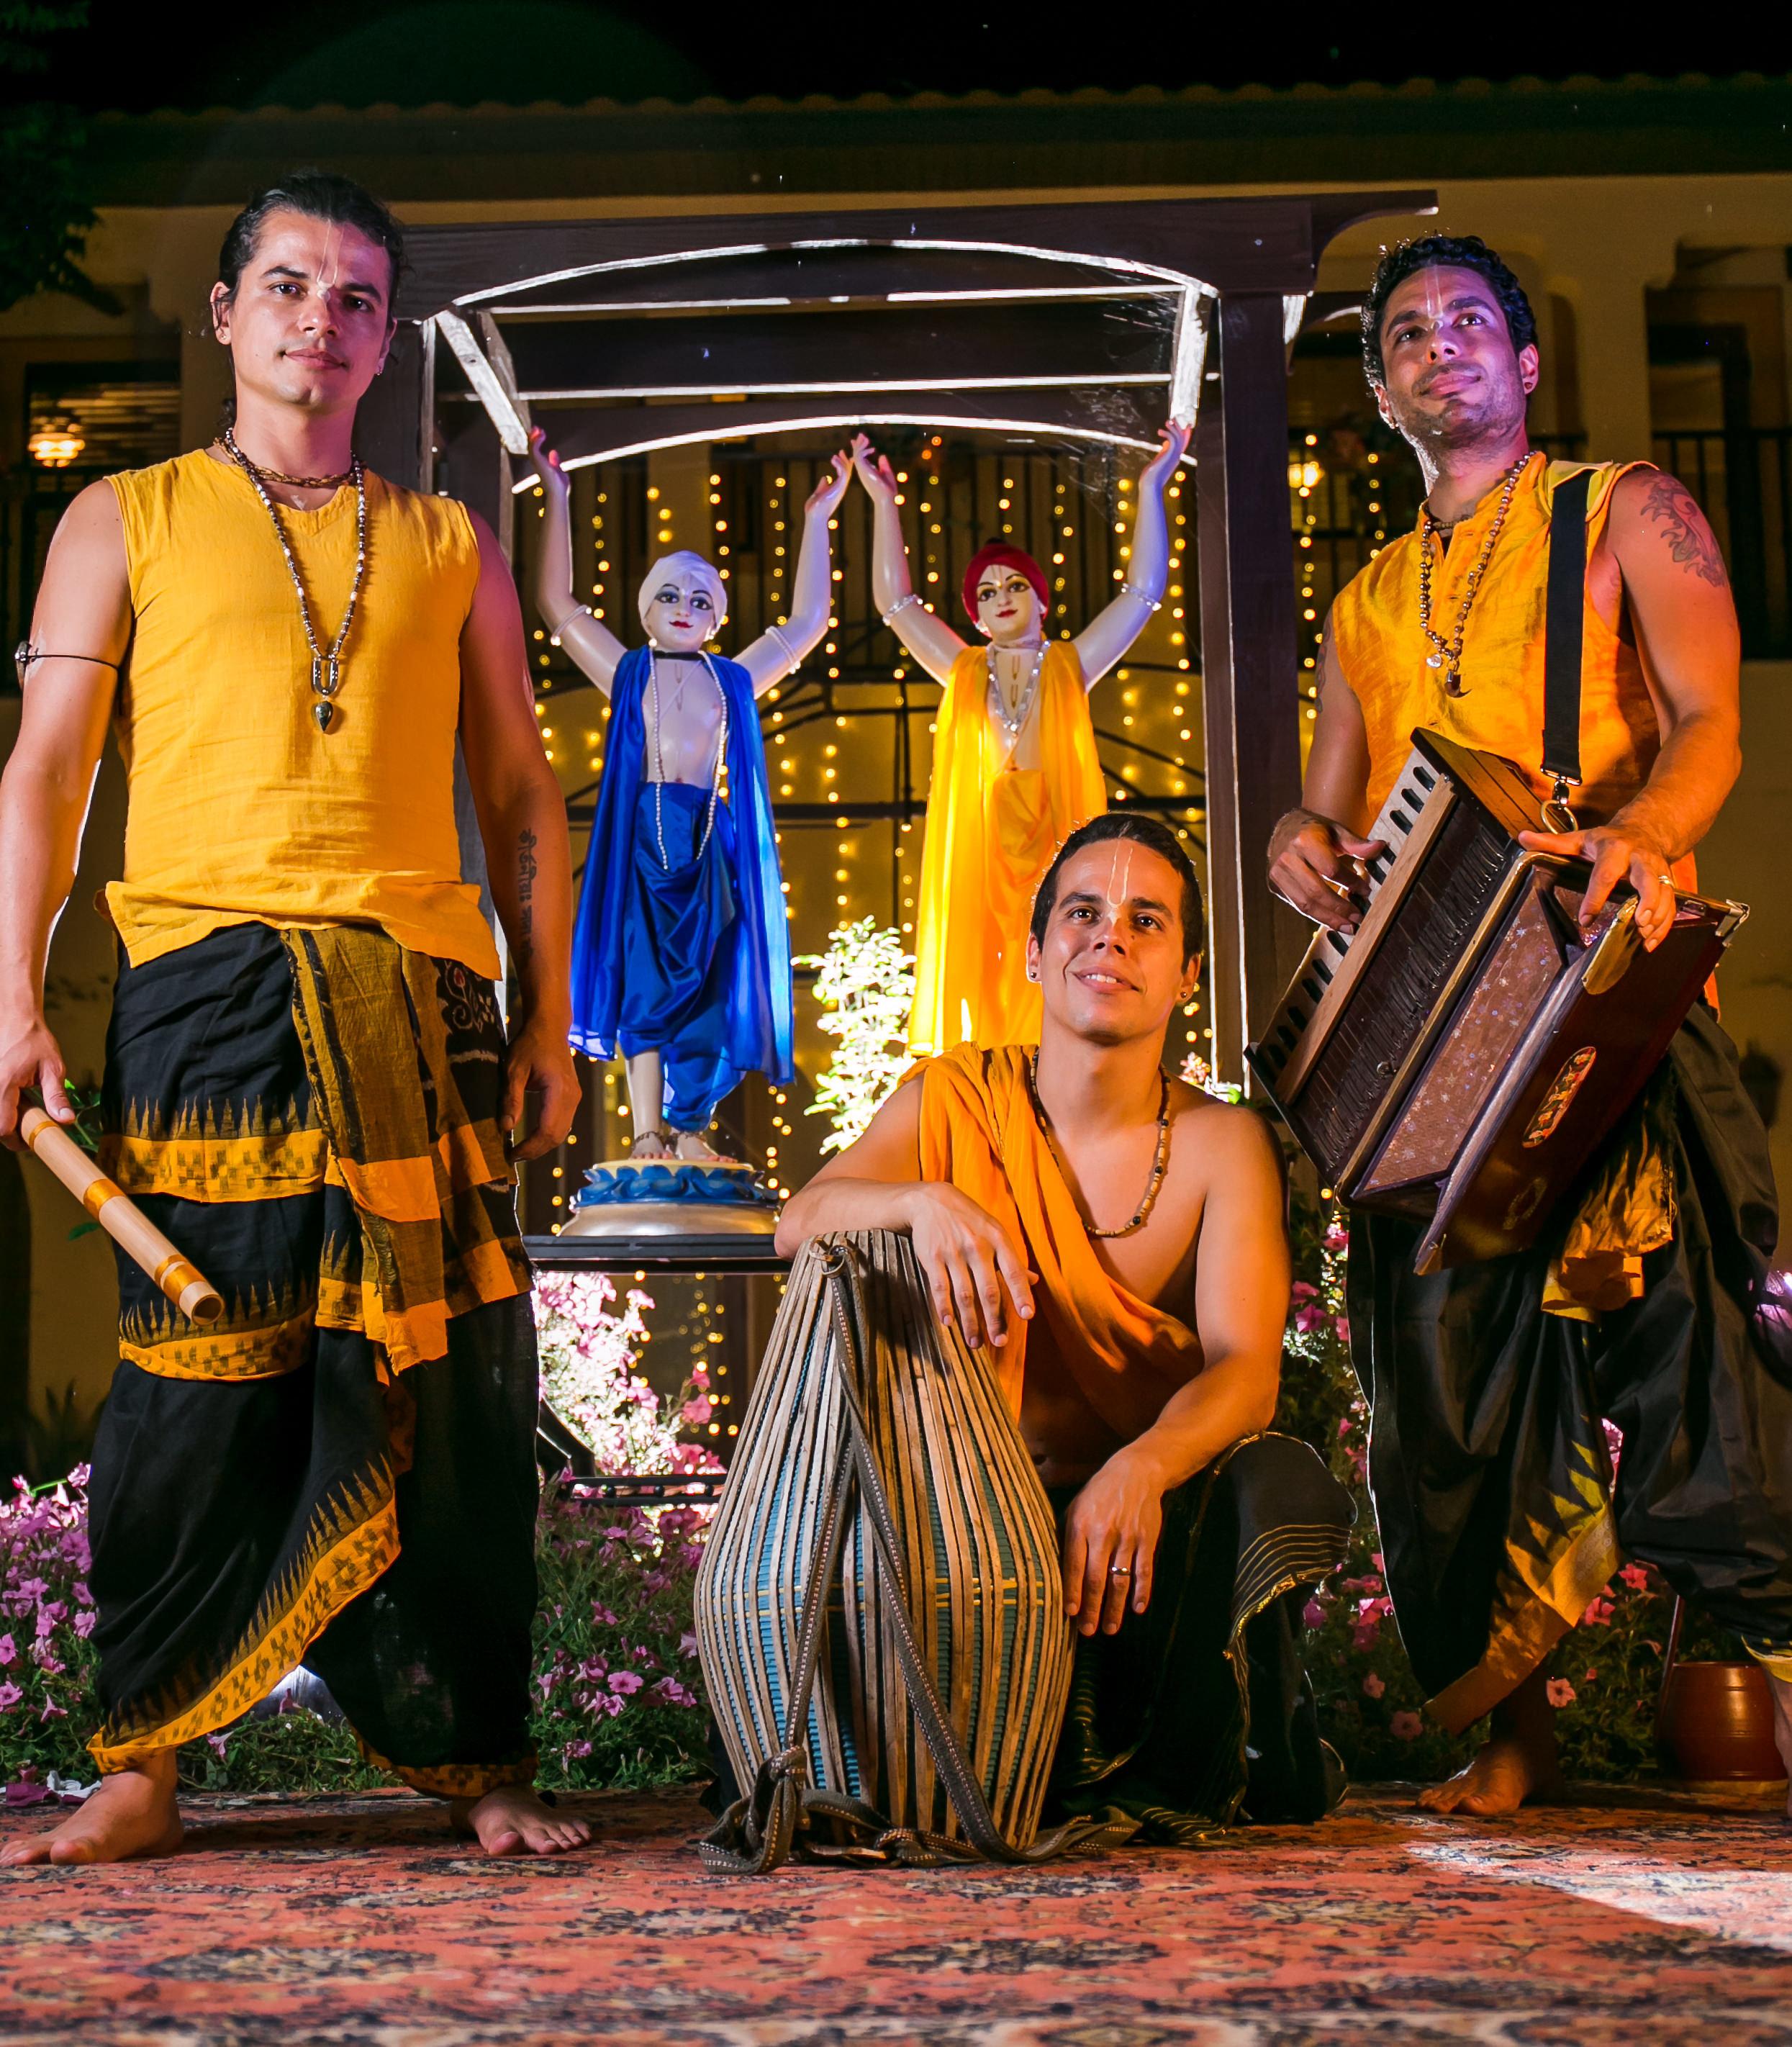 CD Cover Shoot for Mayapuris New CD 9 Islands